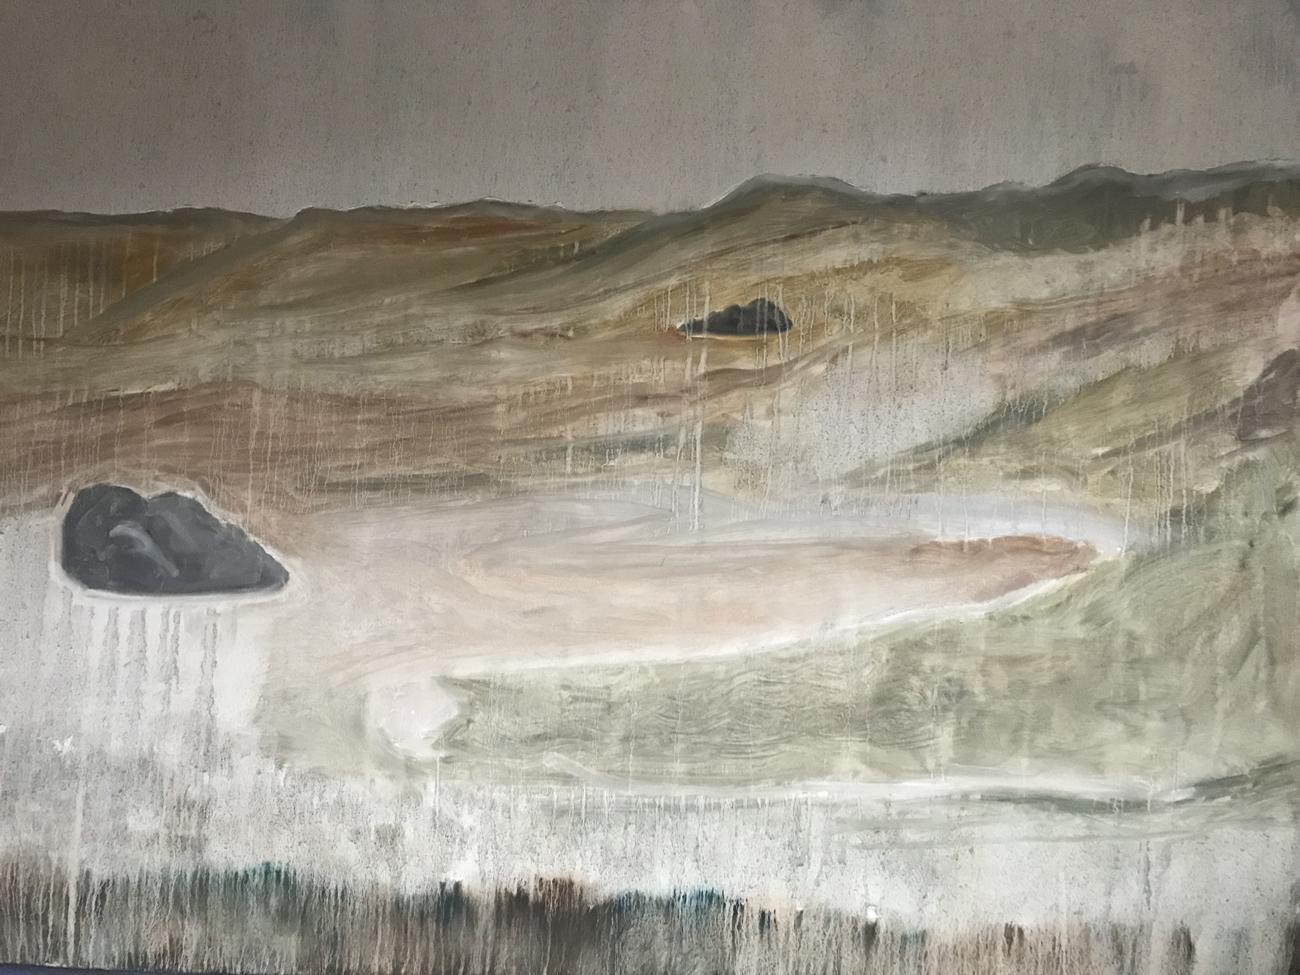 Seema Manchanda, <em>The London Stone</em>,<br>Oil on Canvas, <br>4ft x 3 ft